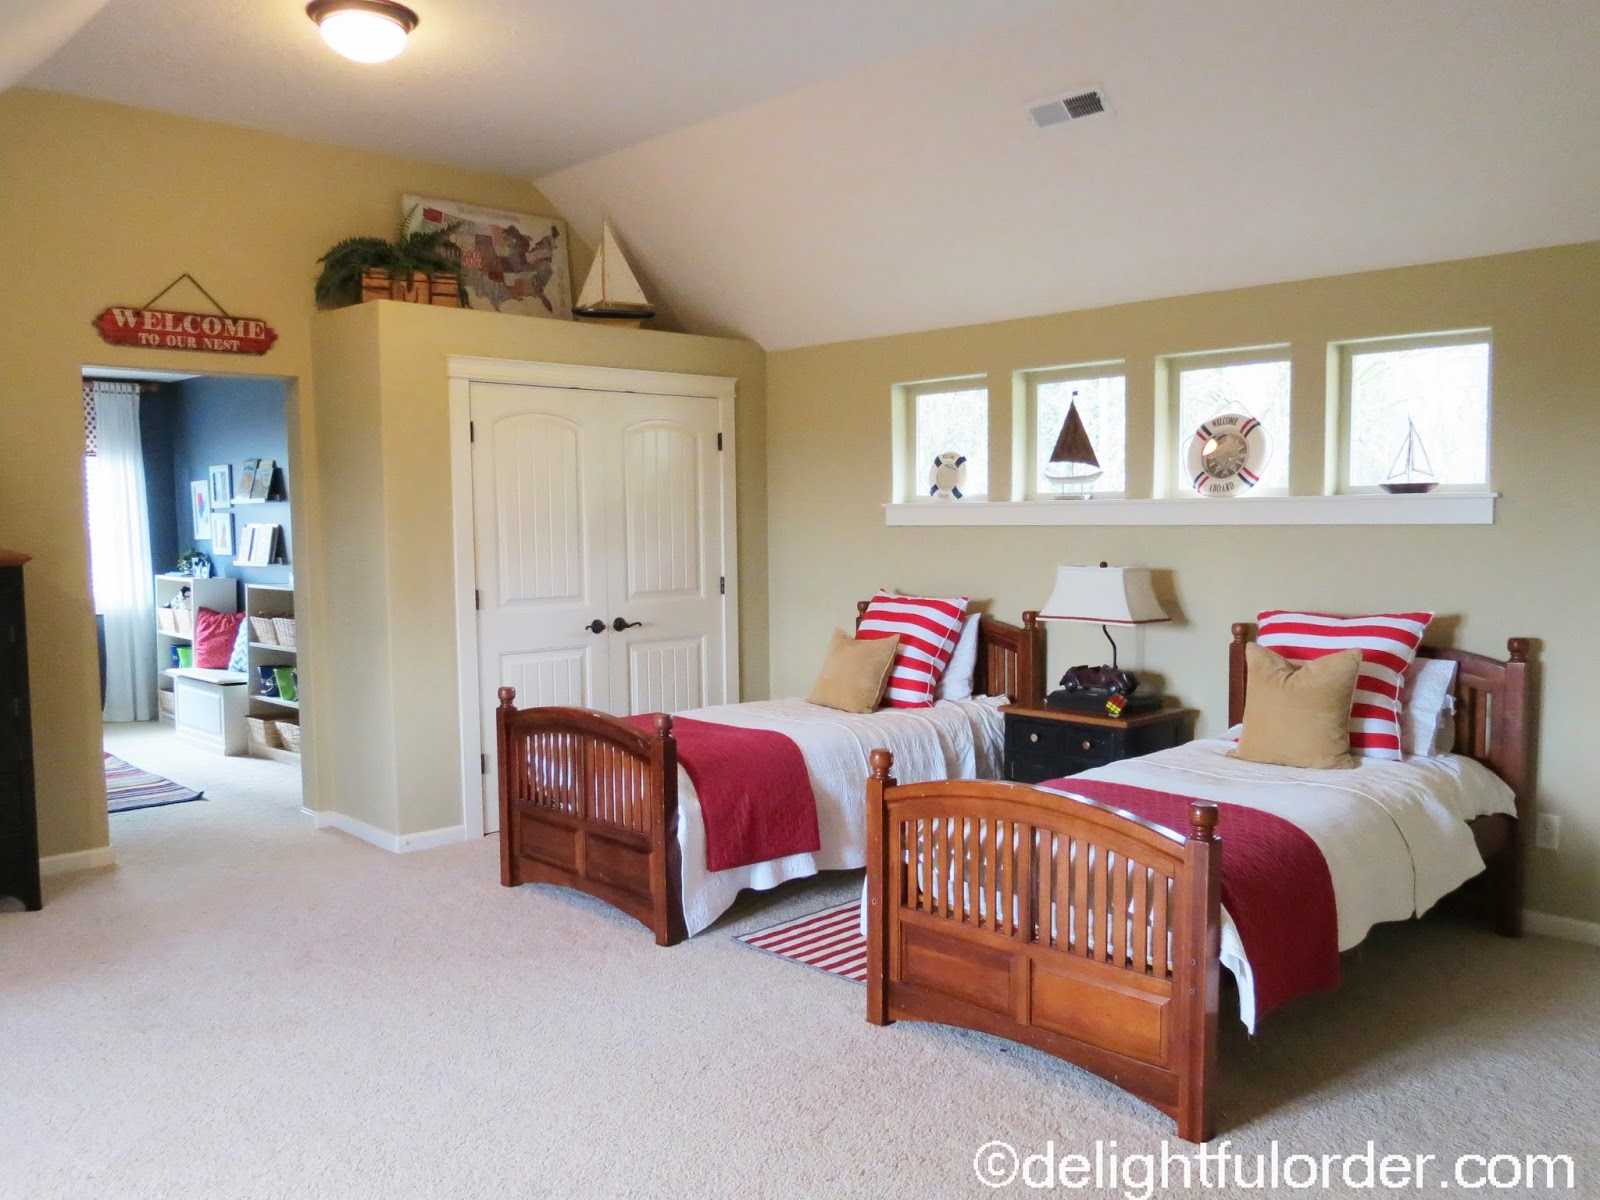 "Shared Boys Geometrical Bedroom: Delightful Order: My Boys' Shared ""Nautical"" Bedroom"